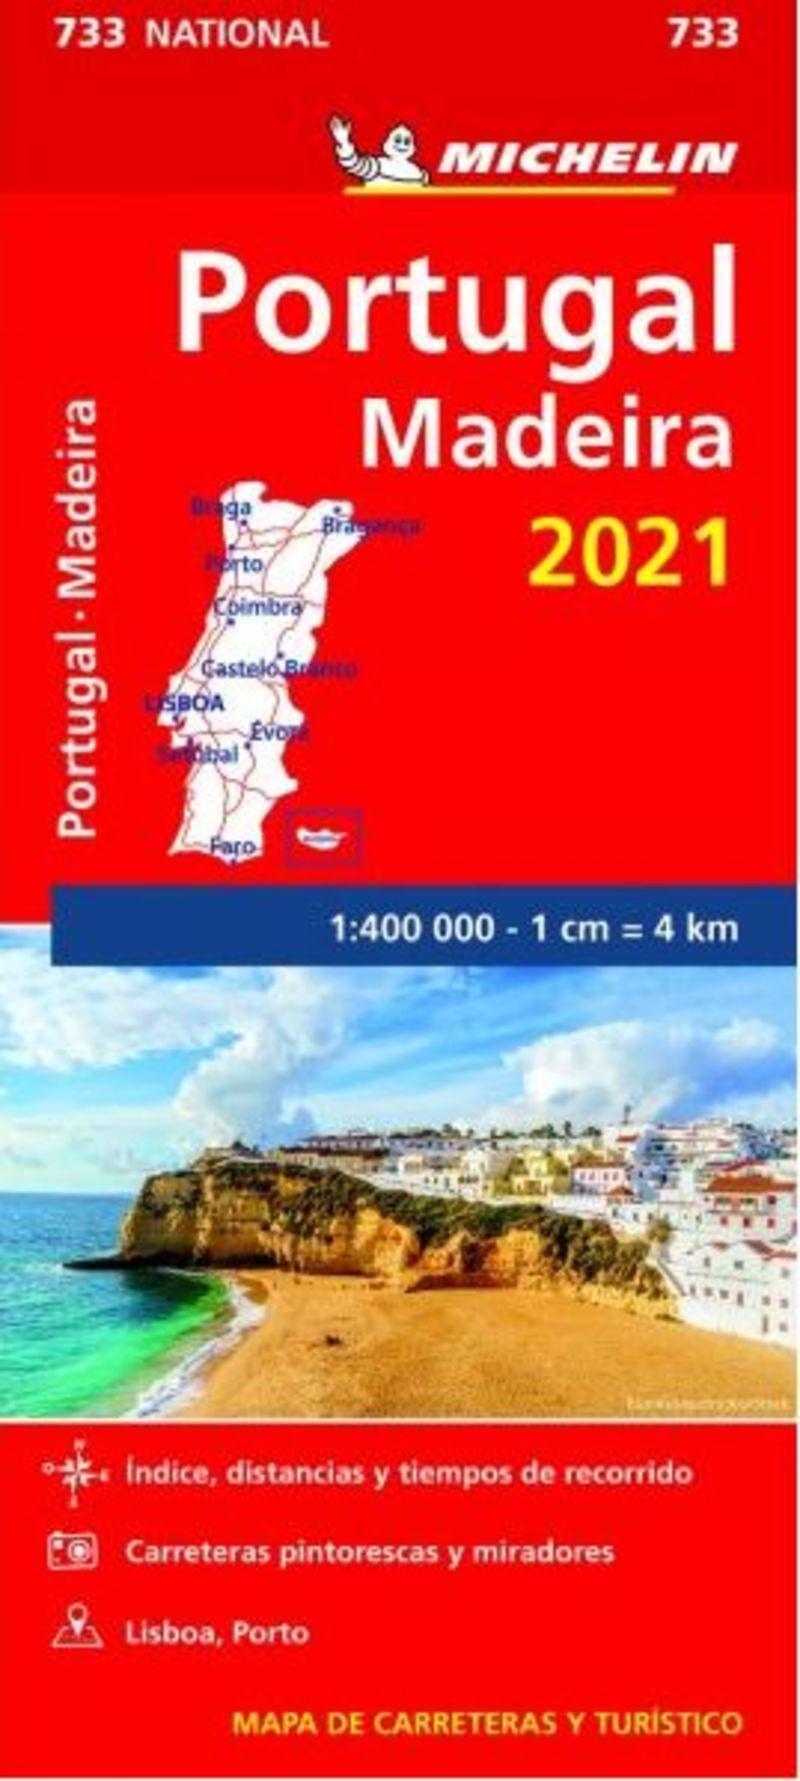 MAPA NATIONAL PORTUGAL, MADEIRA 2021 (11733)